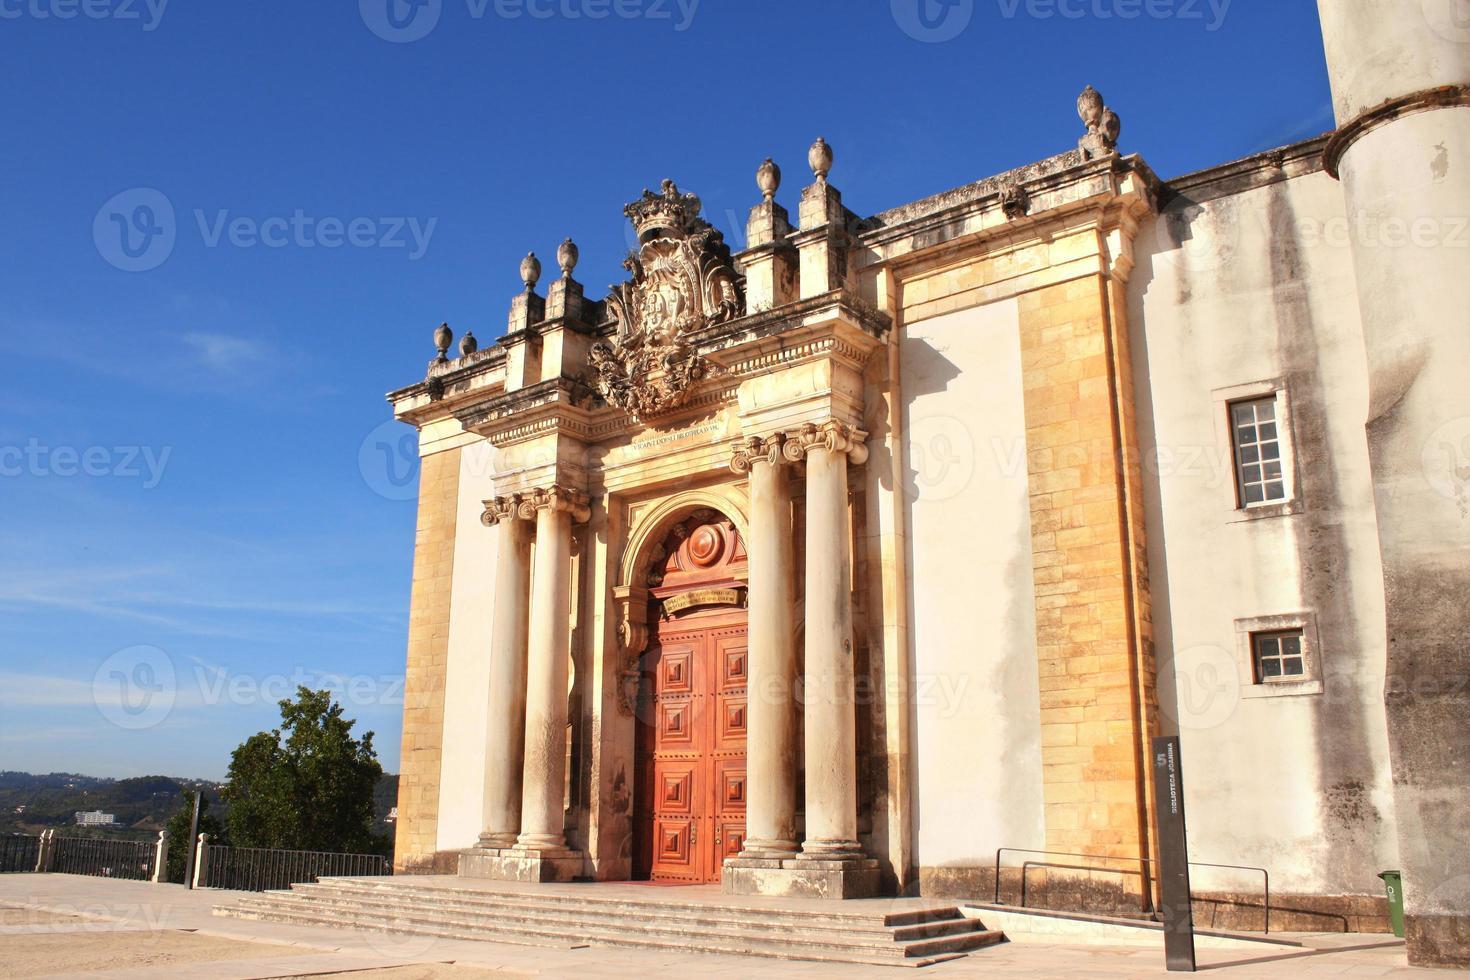 Eingang der Joanina-Bibliothek, Coimbra-Universität, Portugal foto